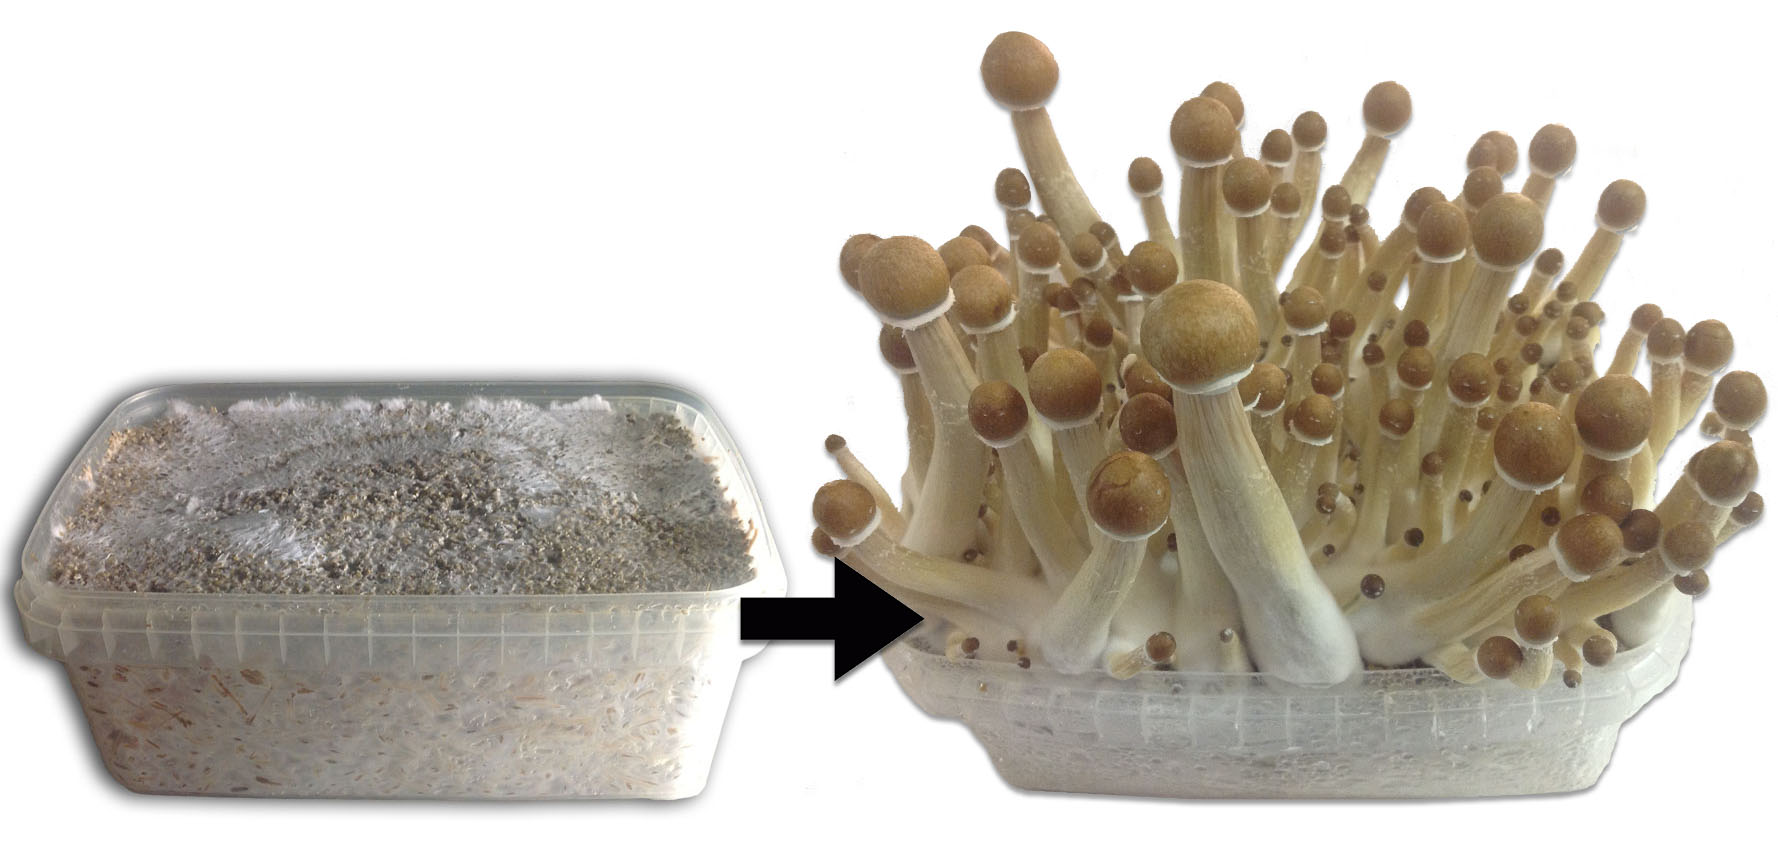 100 Percent Mycelium Growking Instructions Trufflemagic